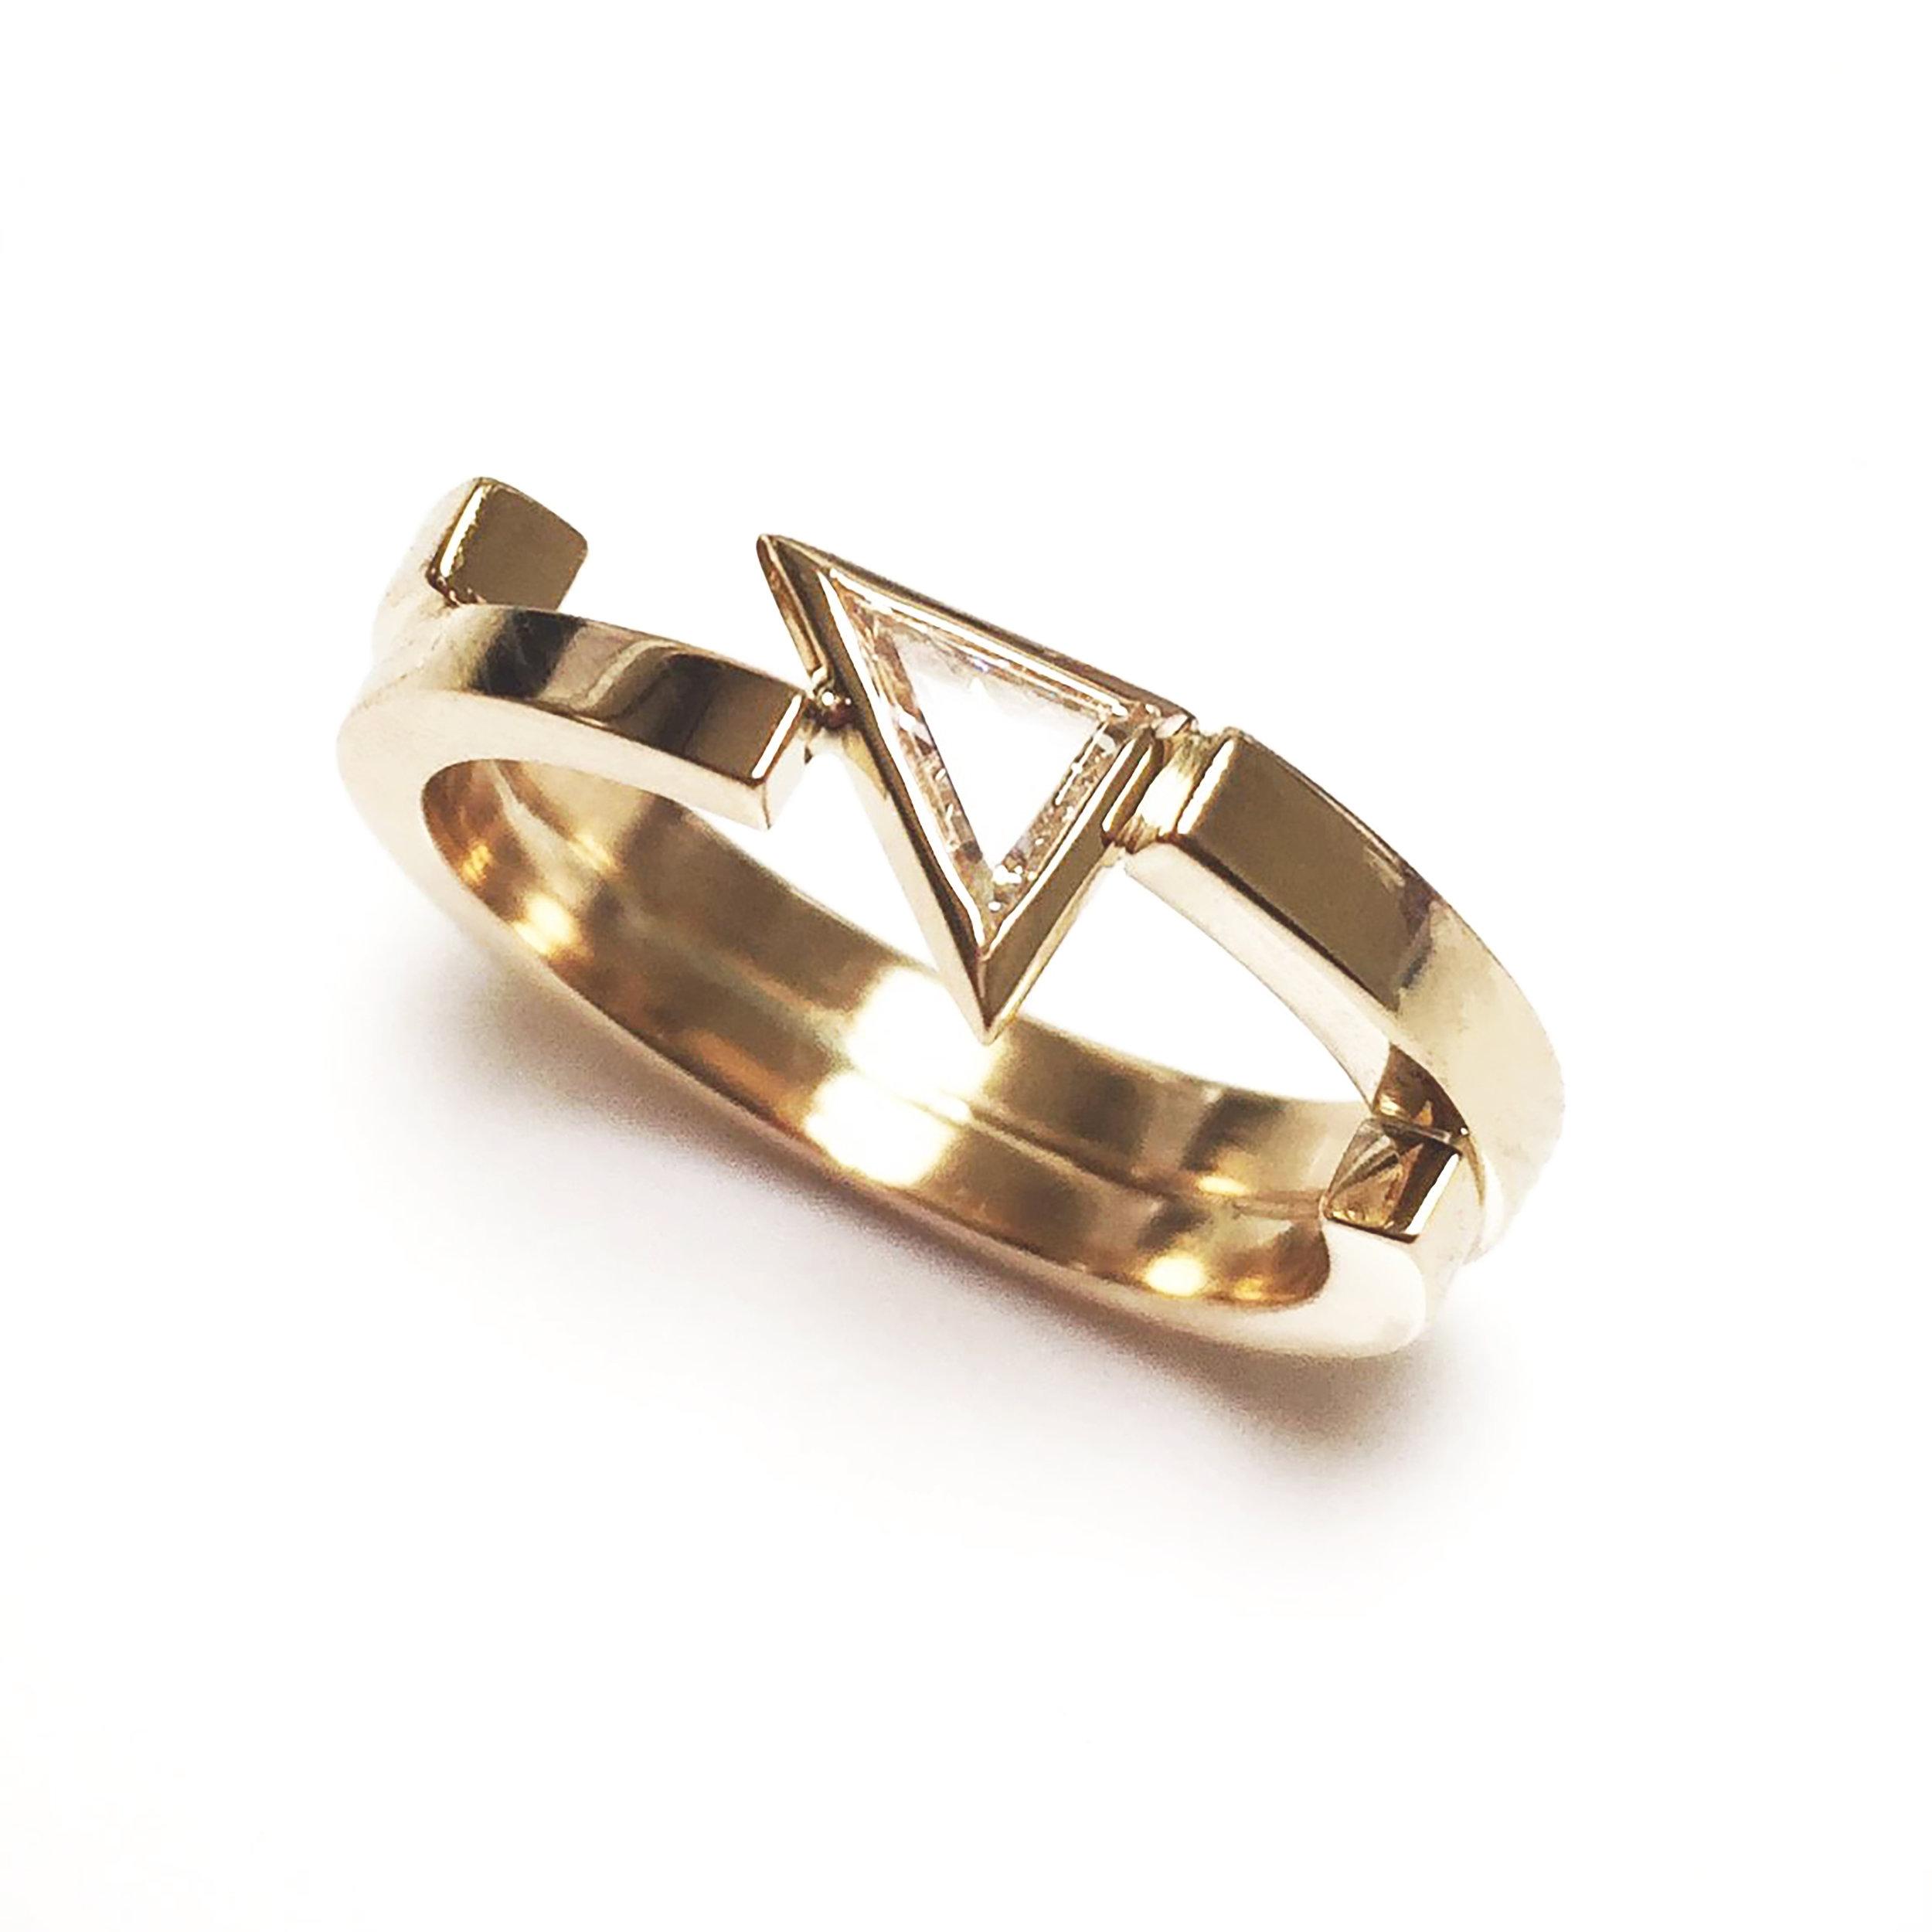 Tilda Biehn Brooklyn NYC Custom Engagement Ring Triangle Diamond